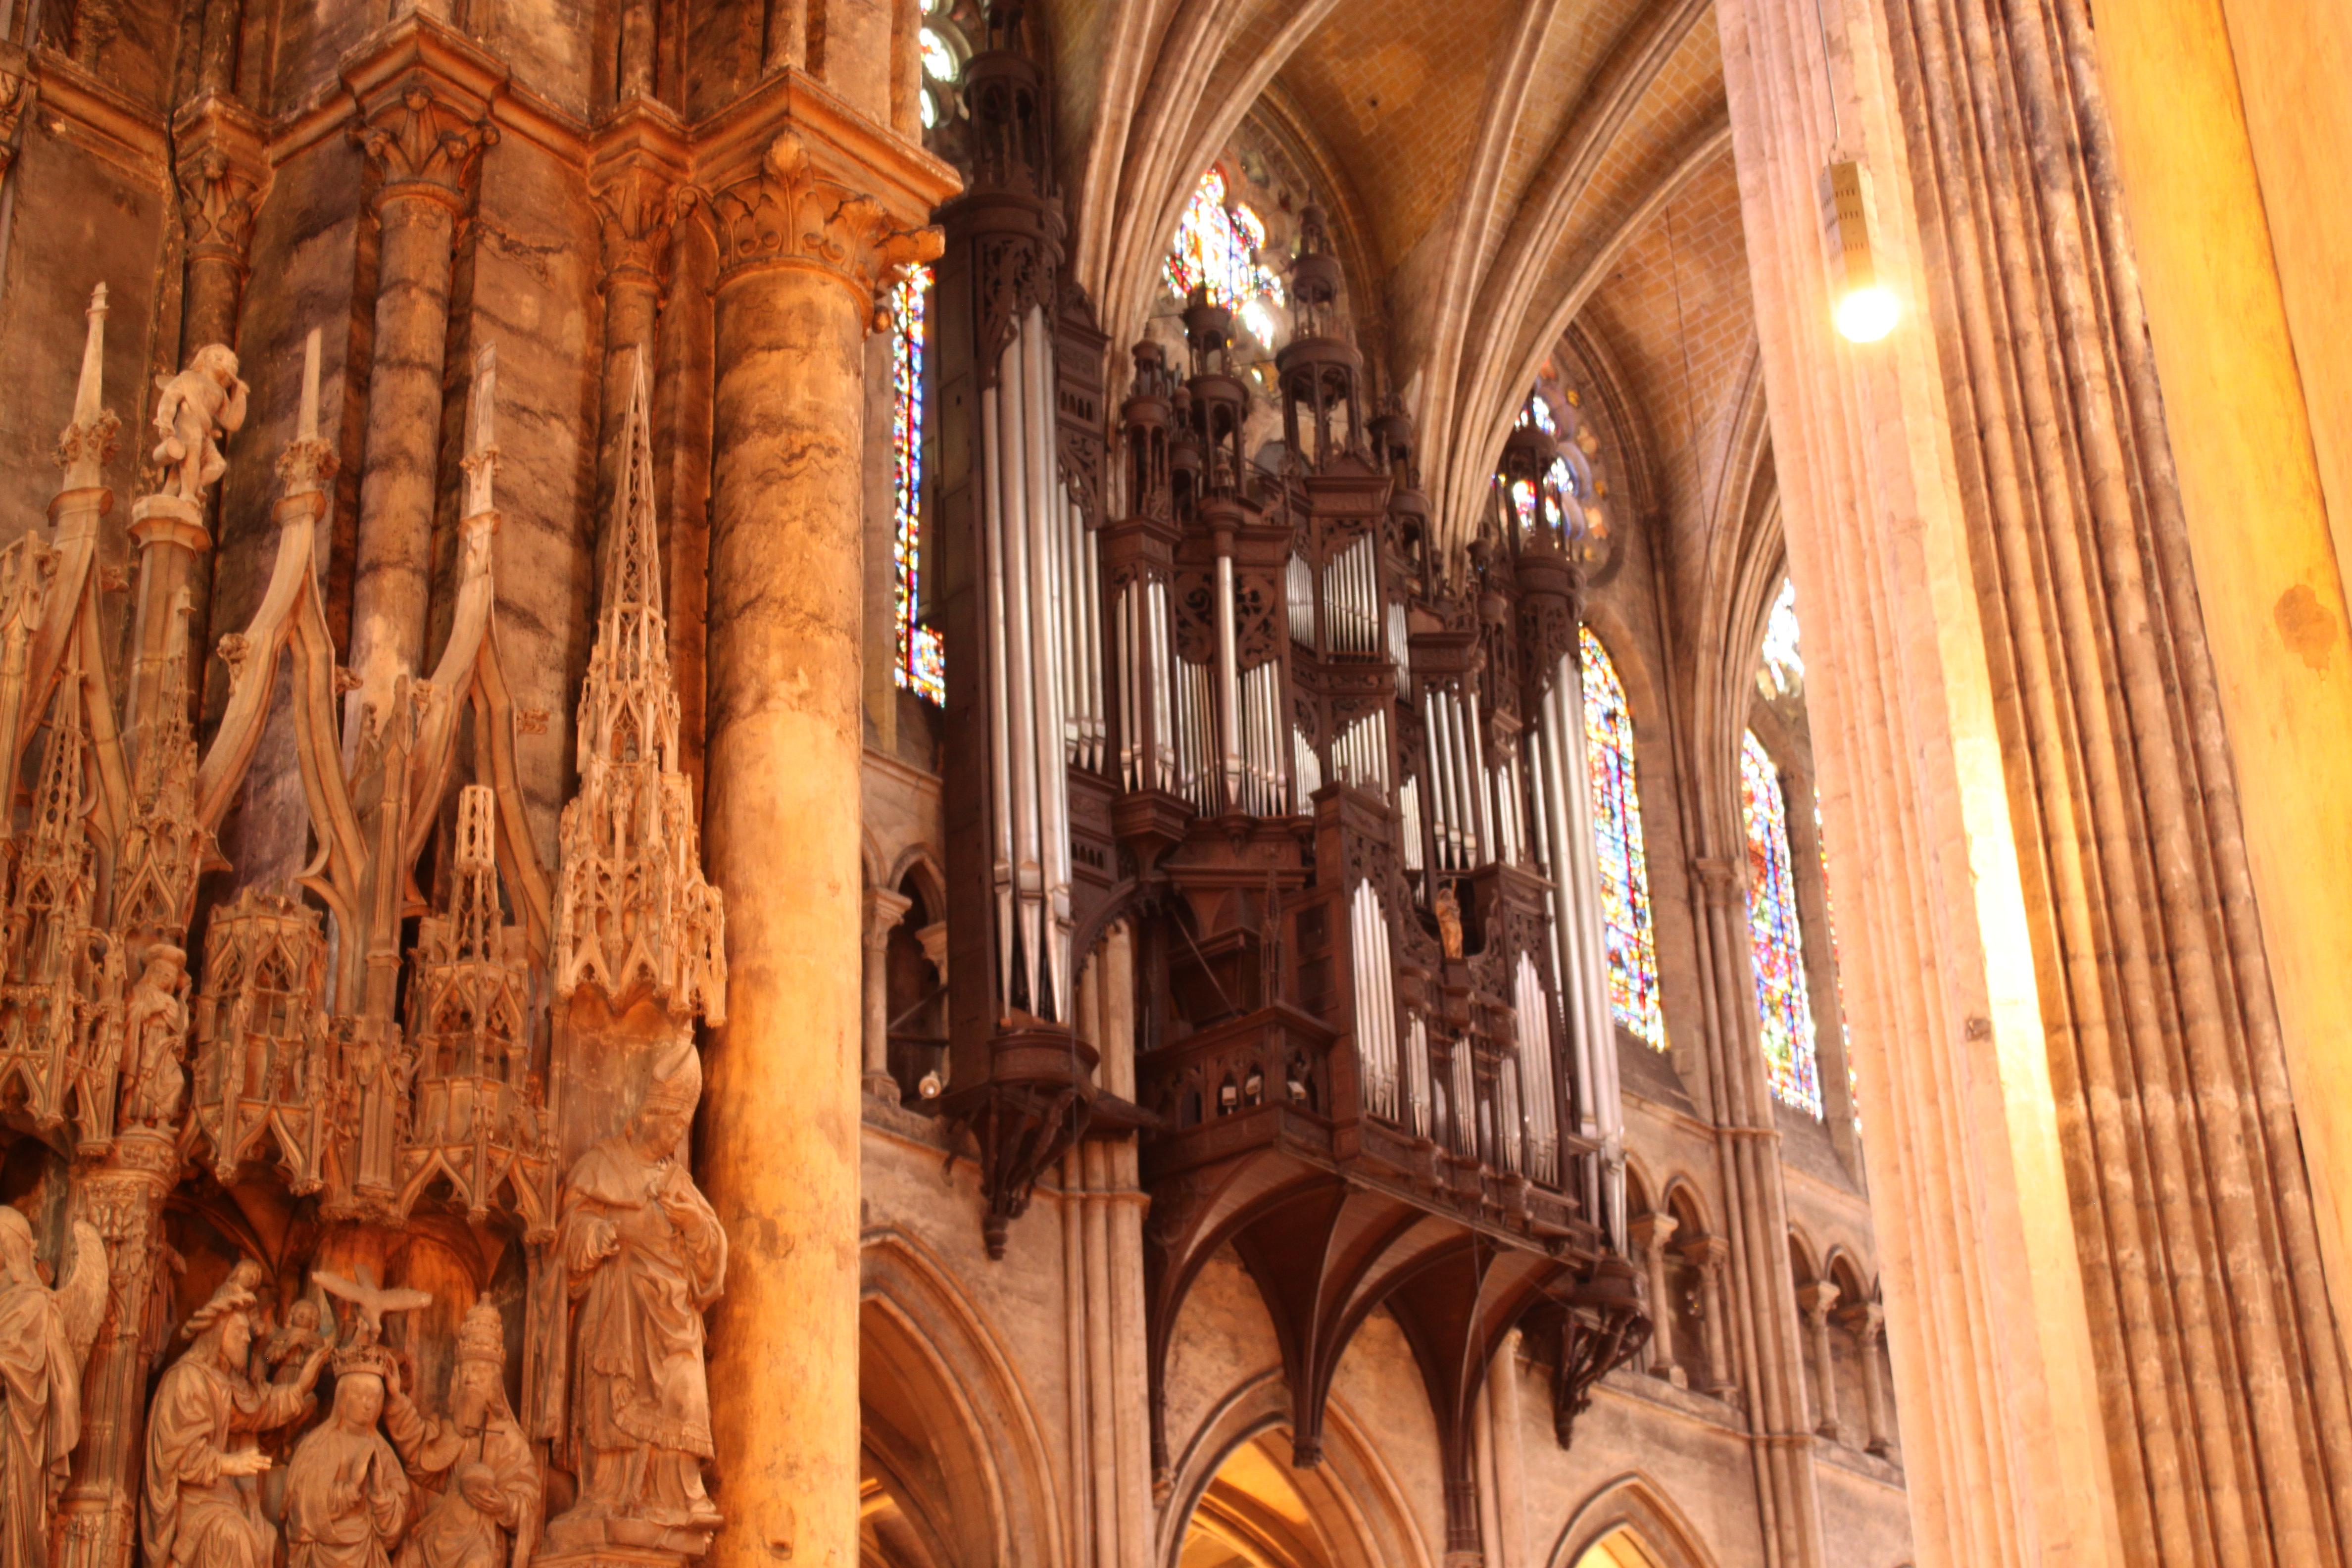 Powerpoint Gantt Chart Template: Cattedrale di Chartres - Wikipedia,Chart